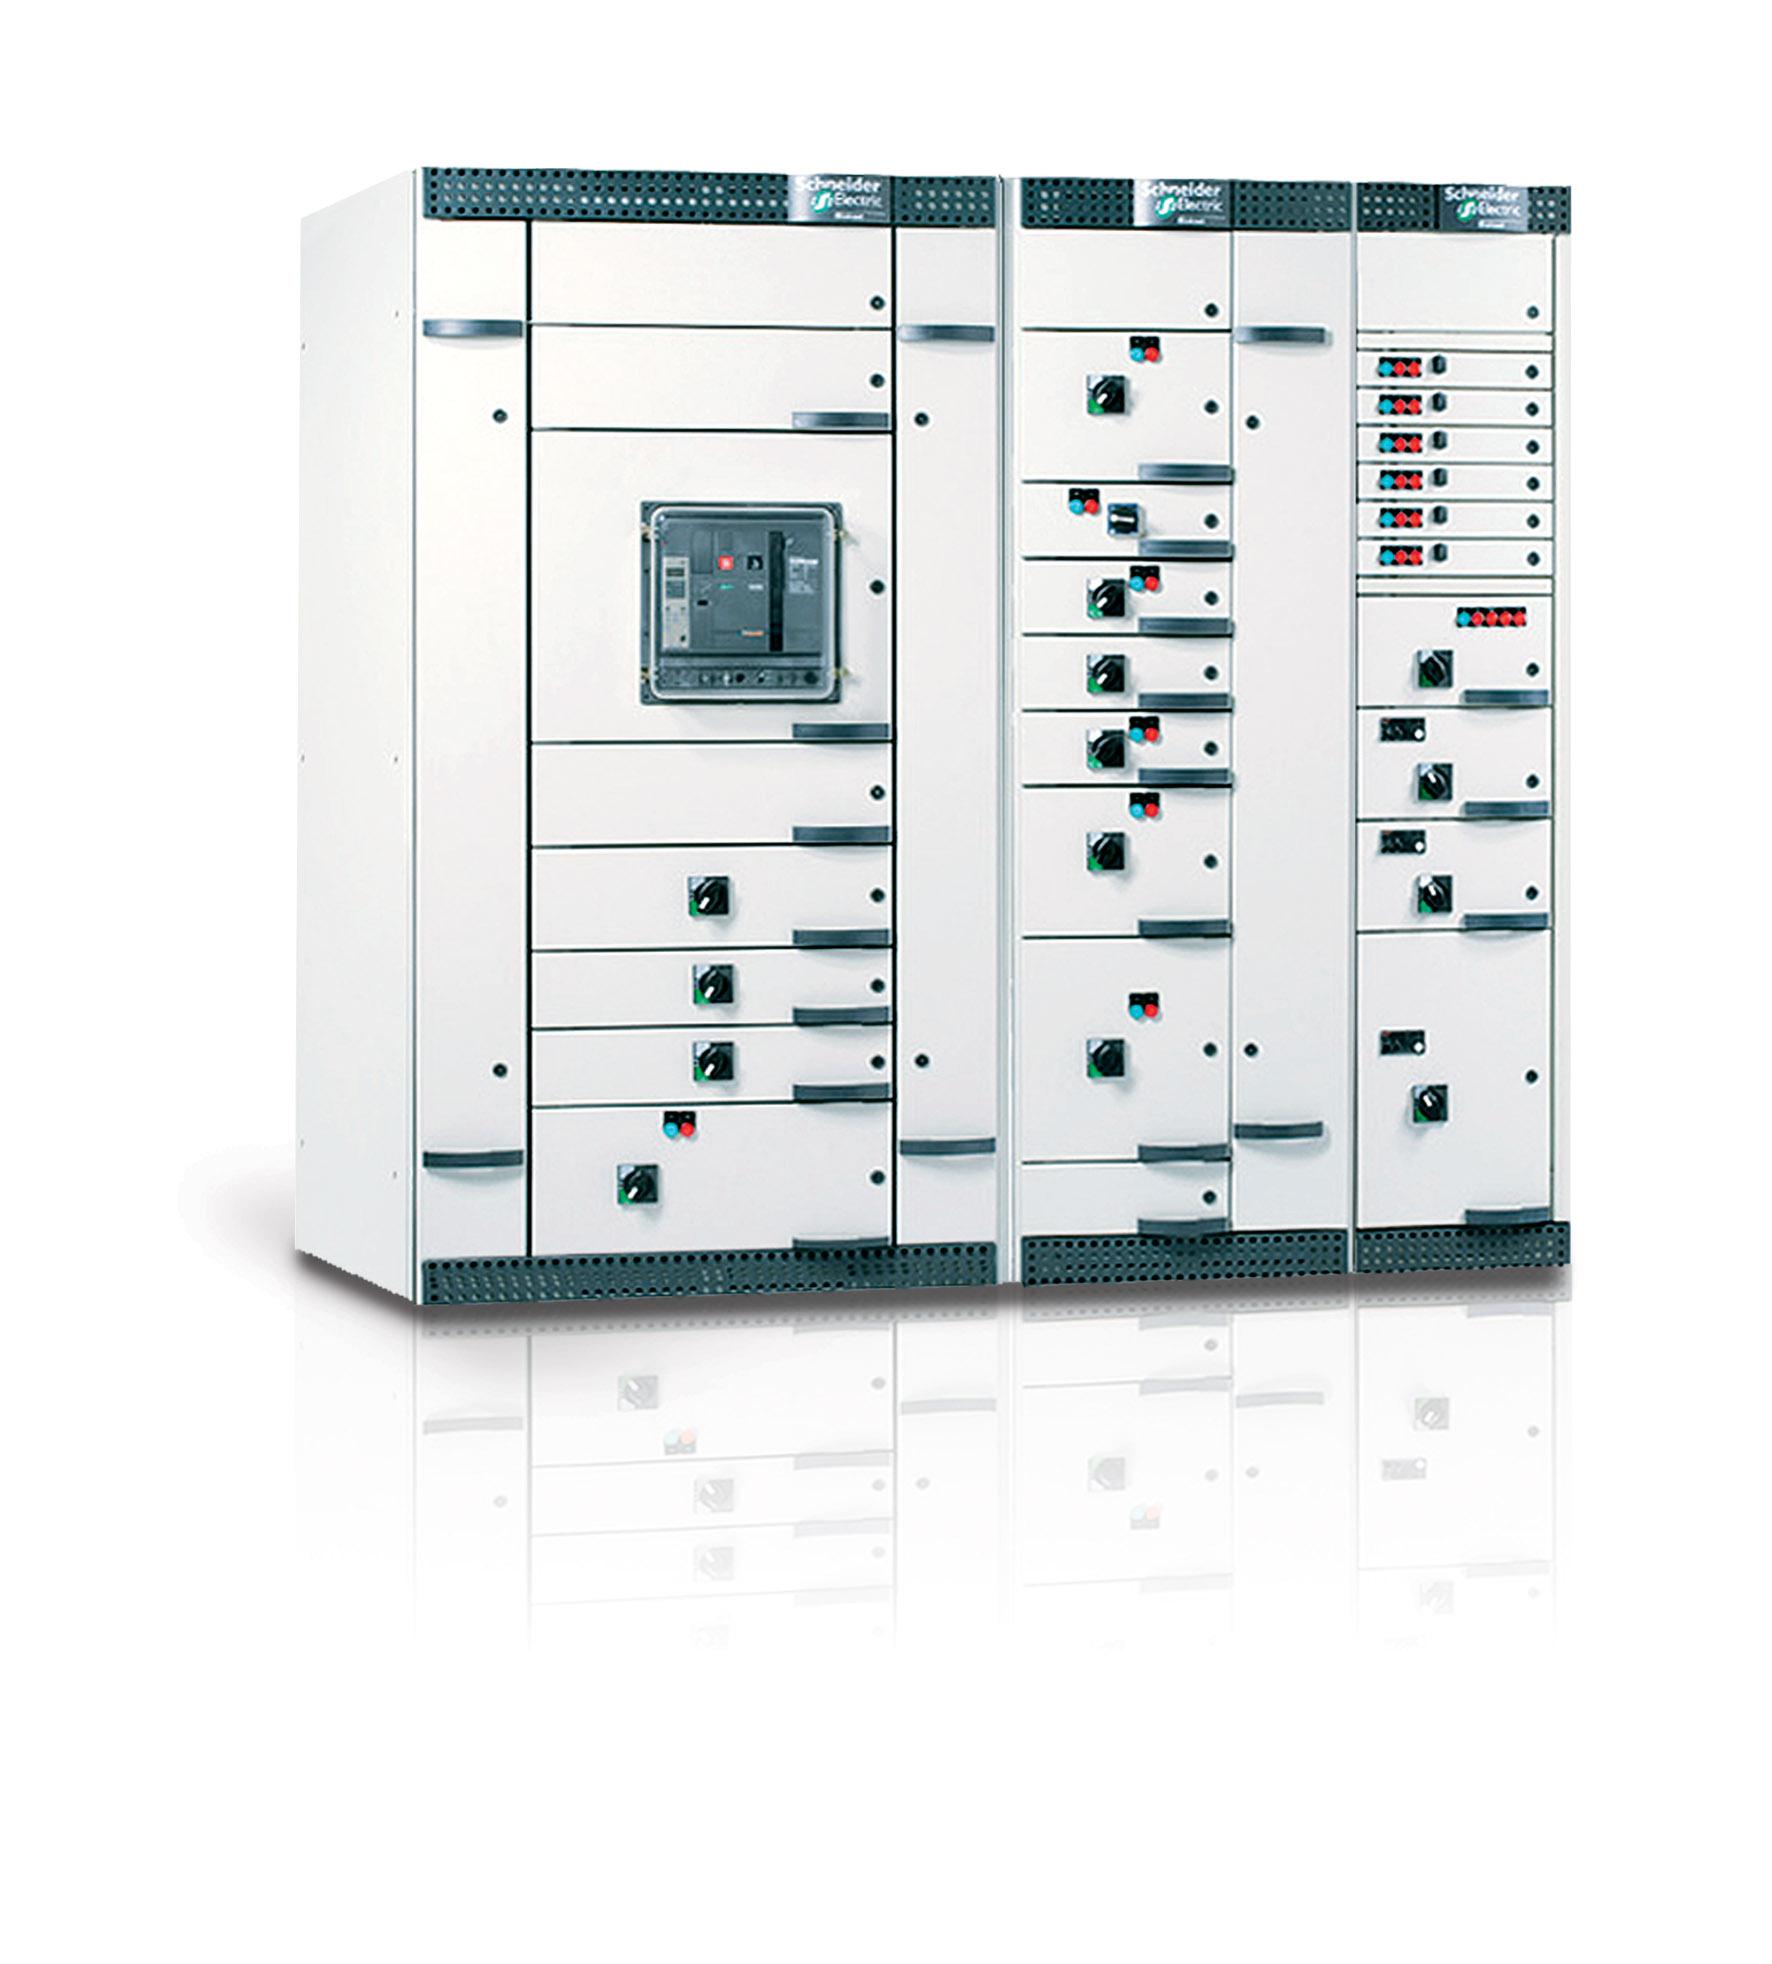 Schneider ra mắt tủ điện hạ thế Blokset